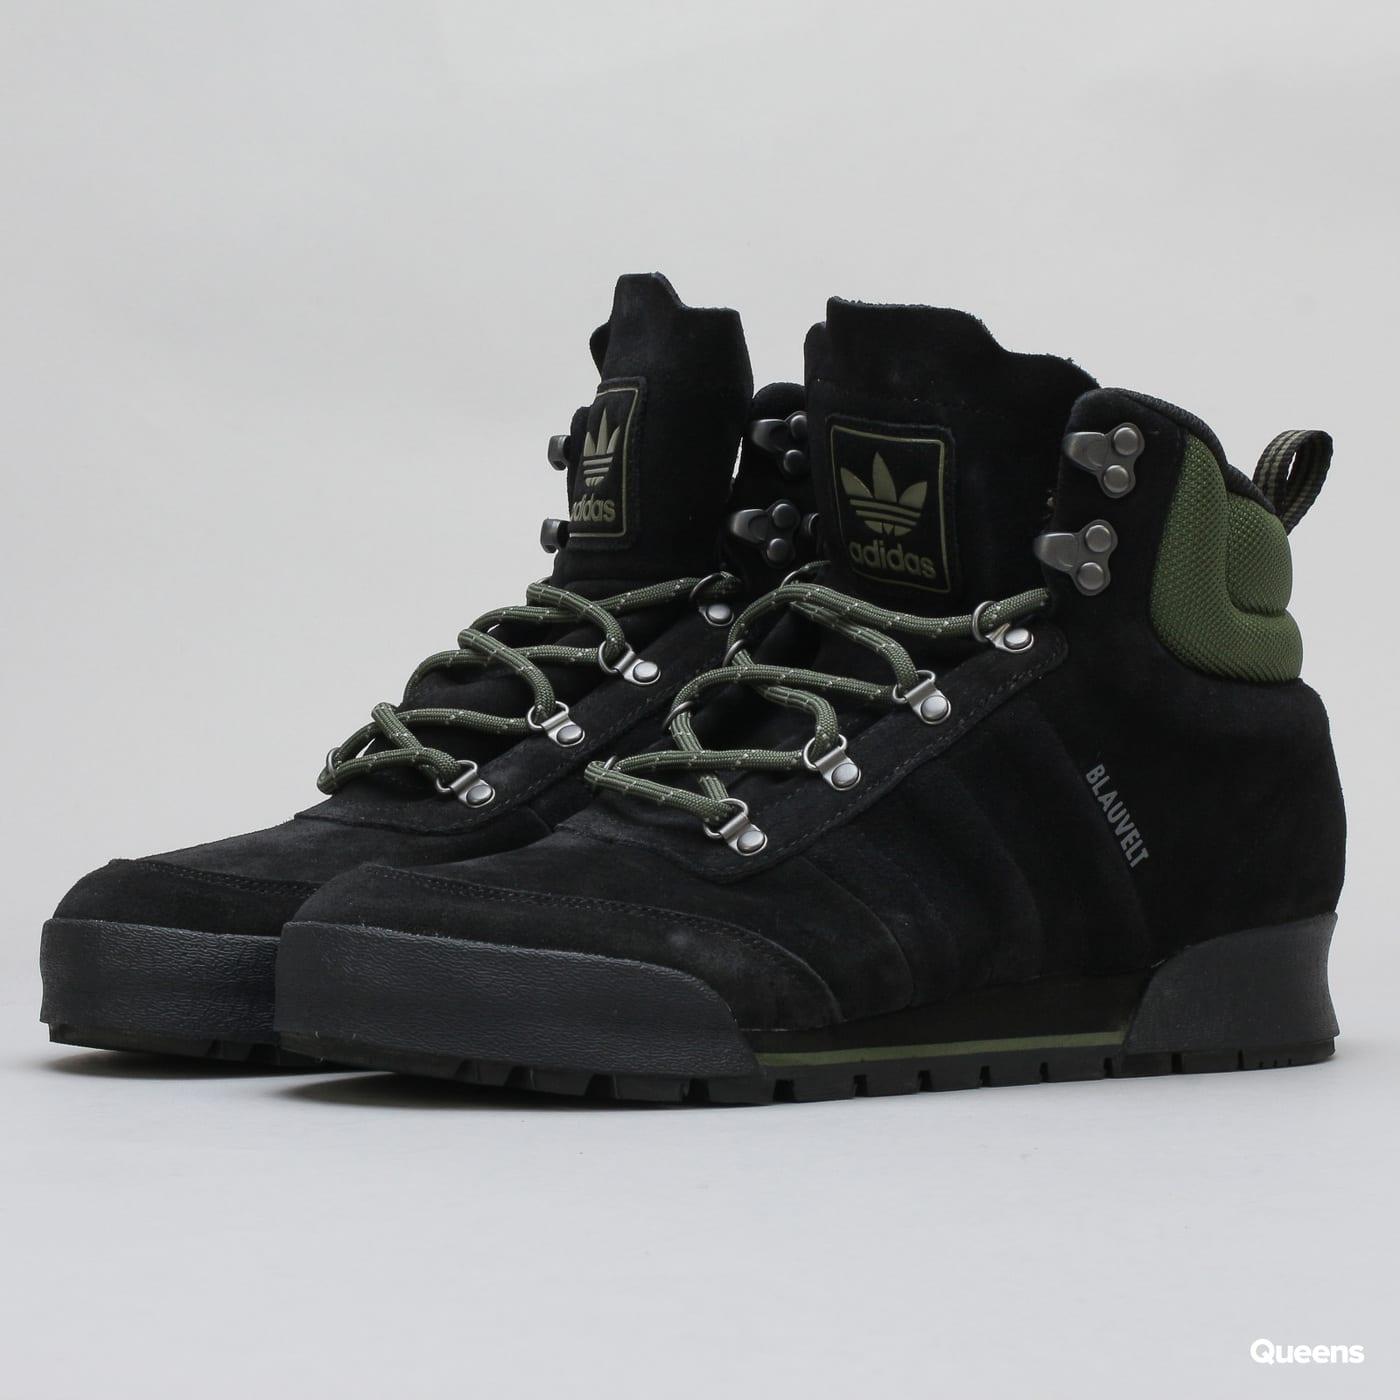 8af15def1e8ce Pánska zimná obuv adidas Jake Boot 2.0 cblack / basgrn / cblack (B41494) –  Queens 💚